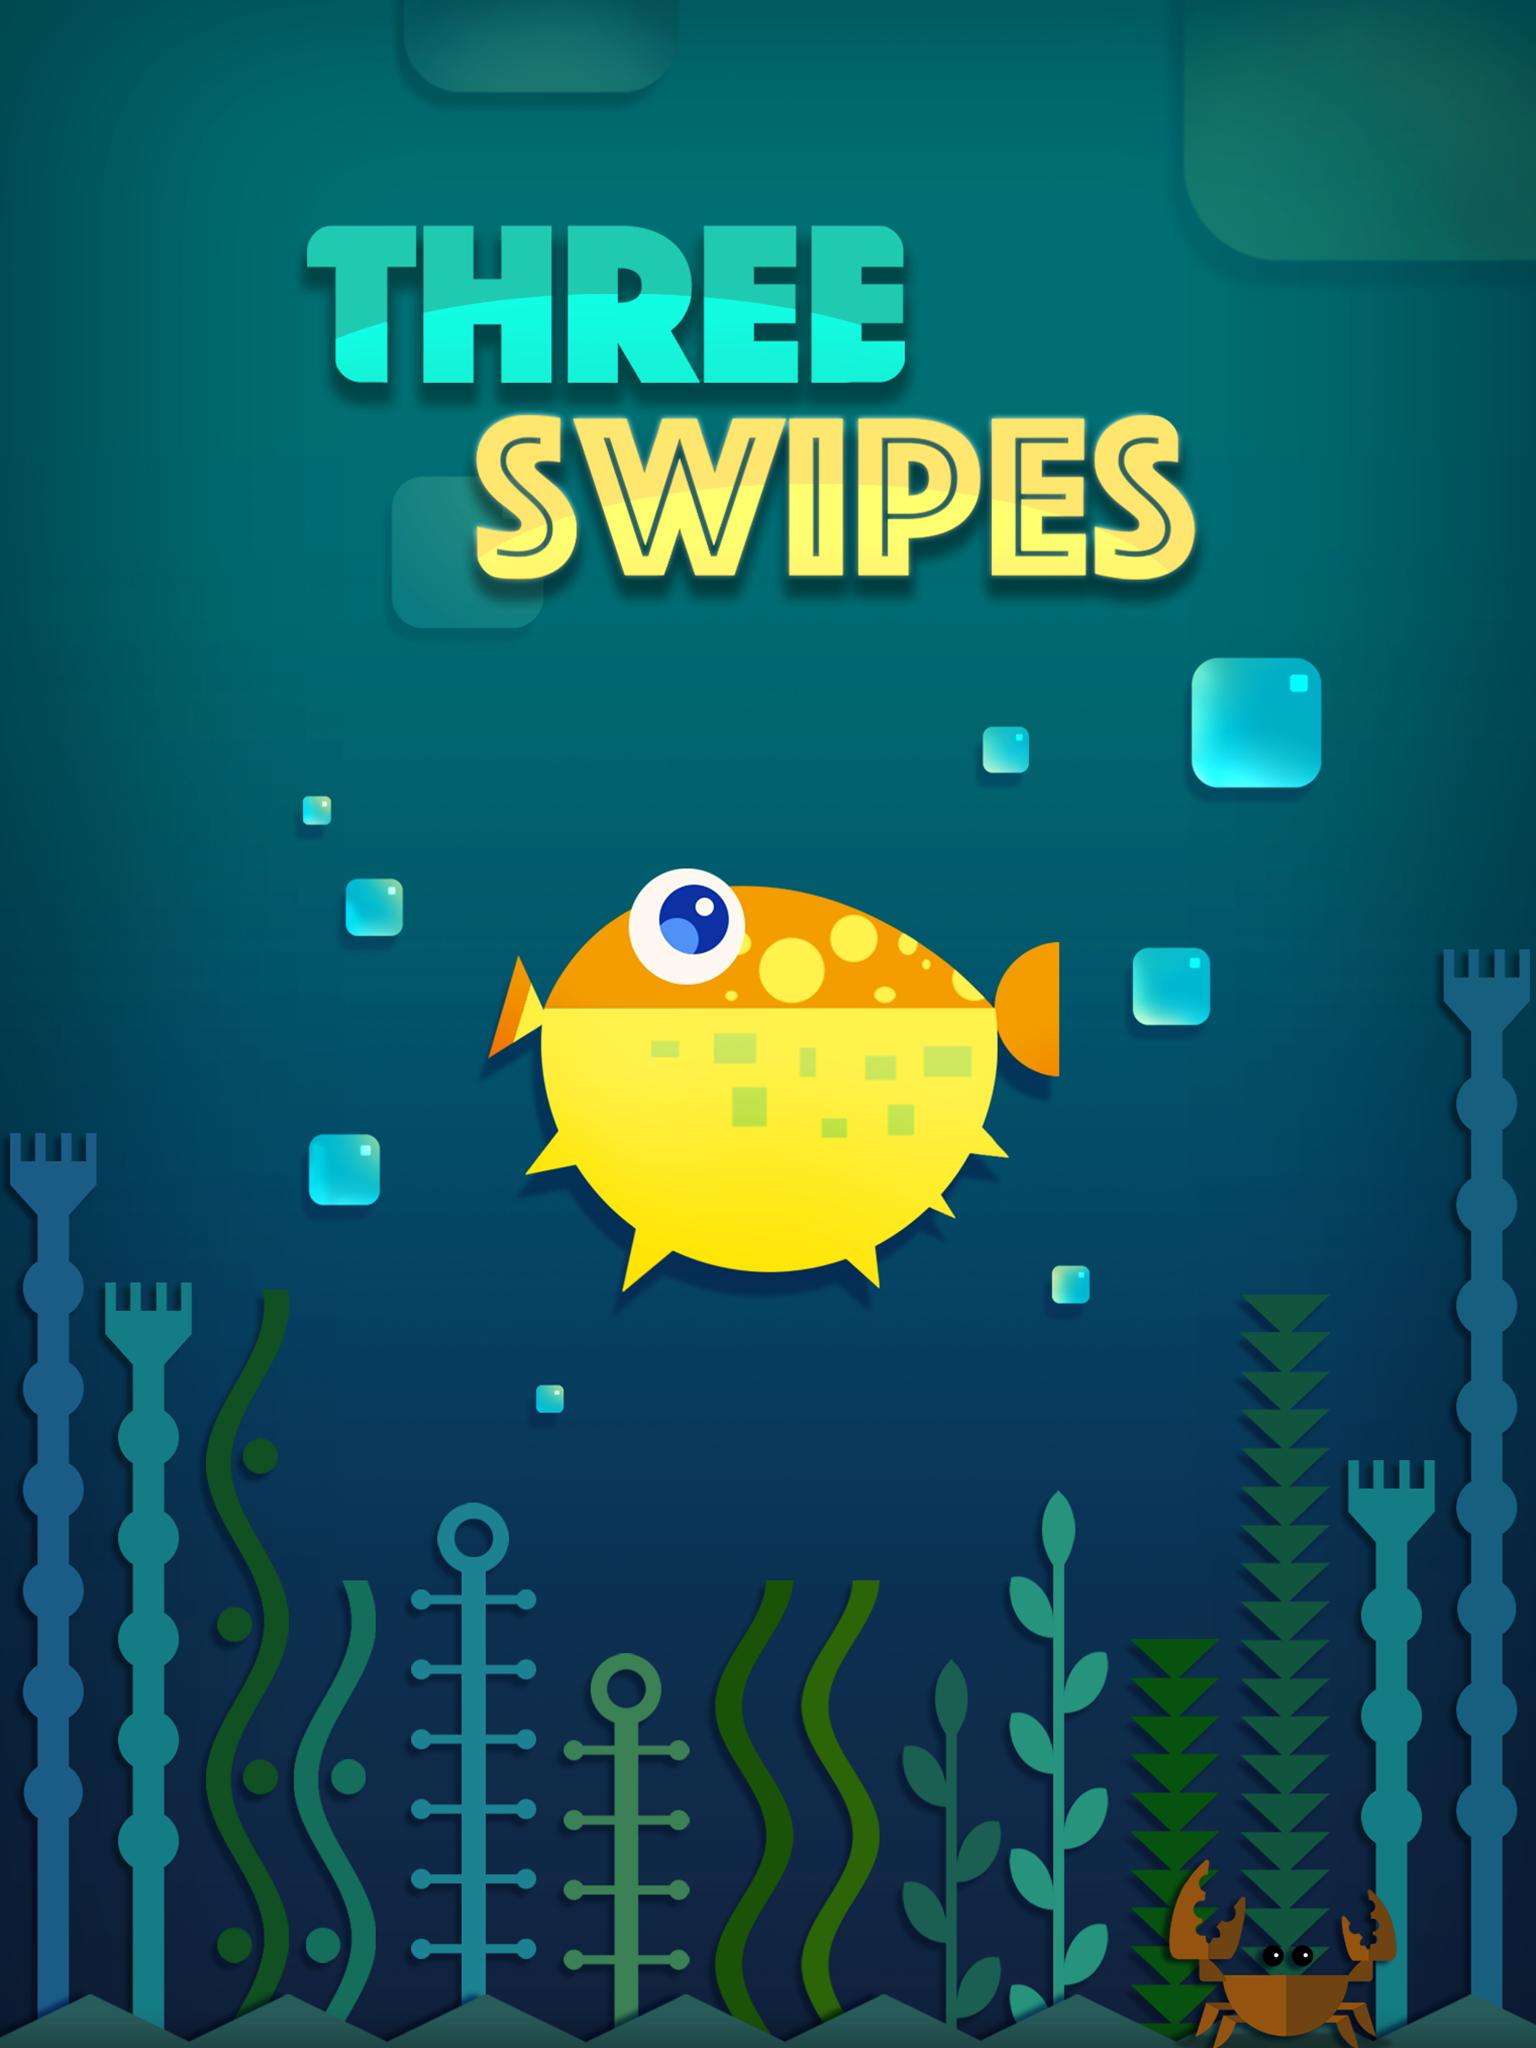 threeSwipes_iPad_title.png